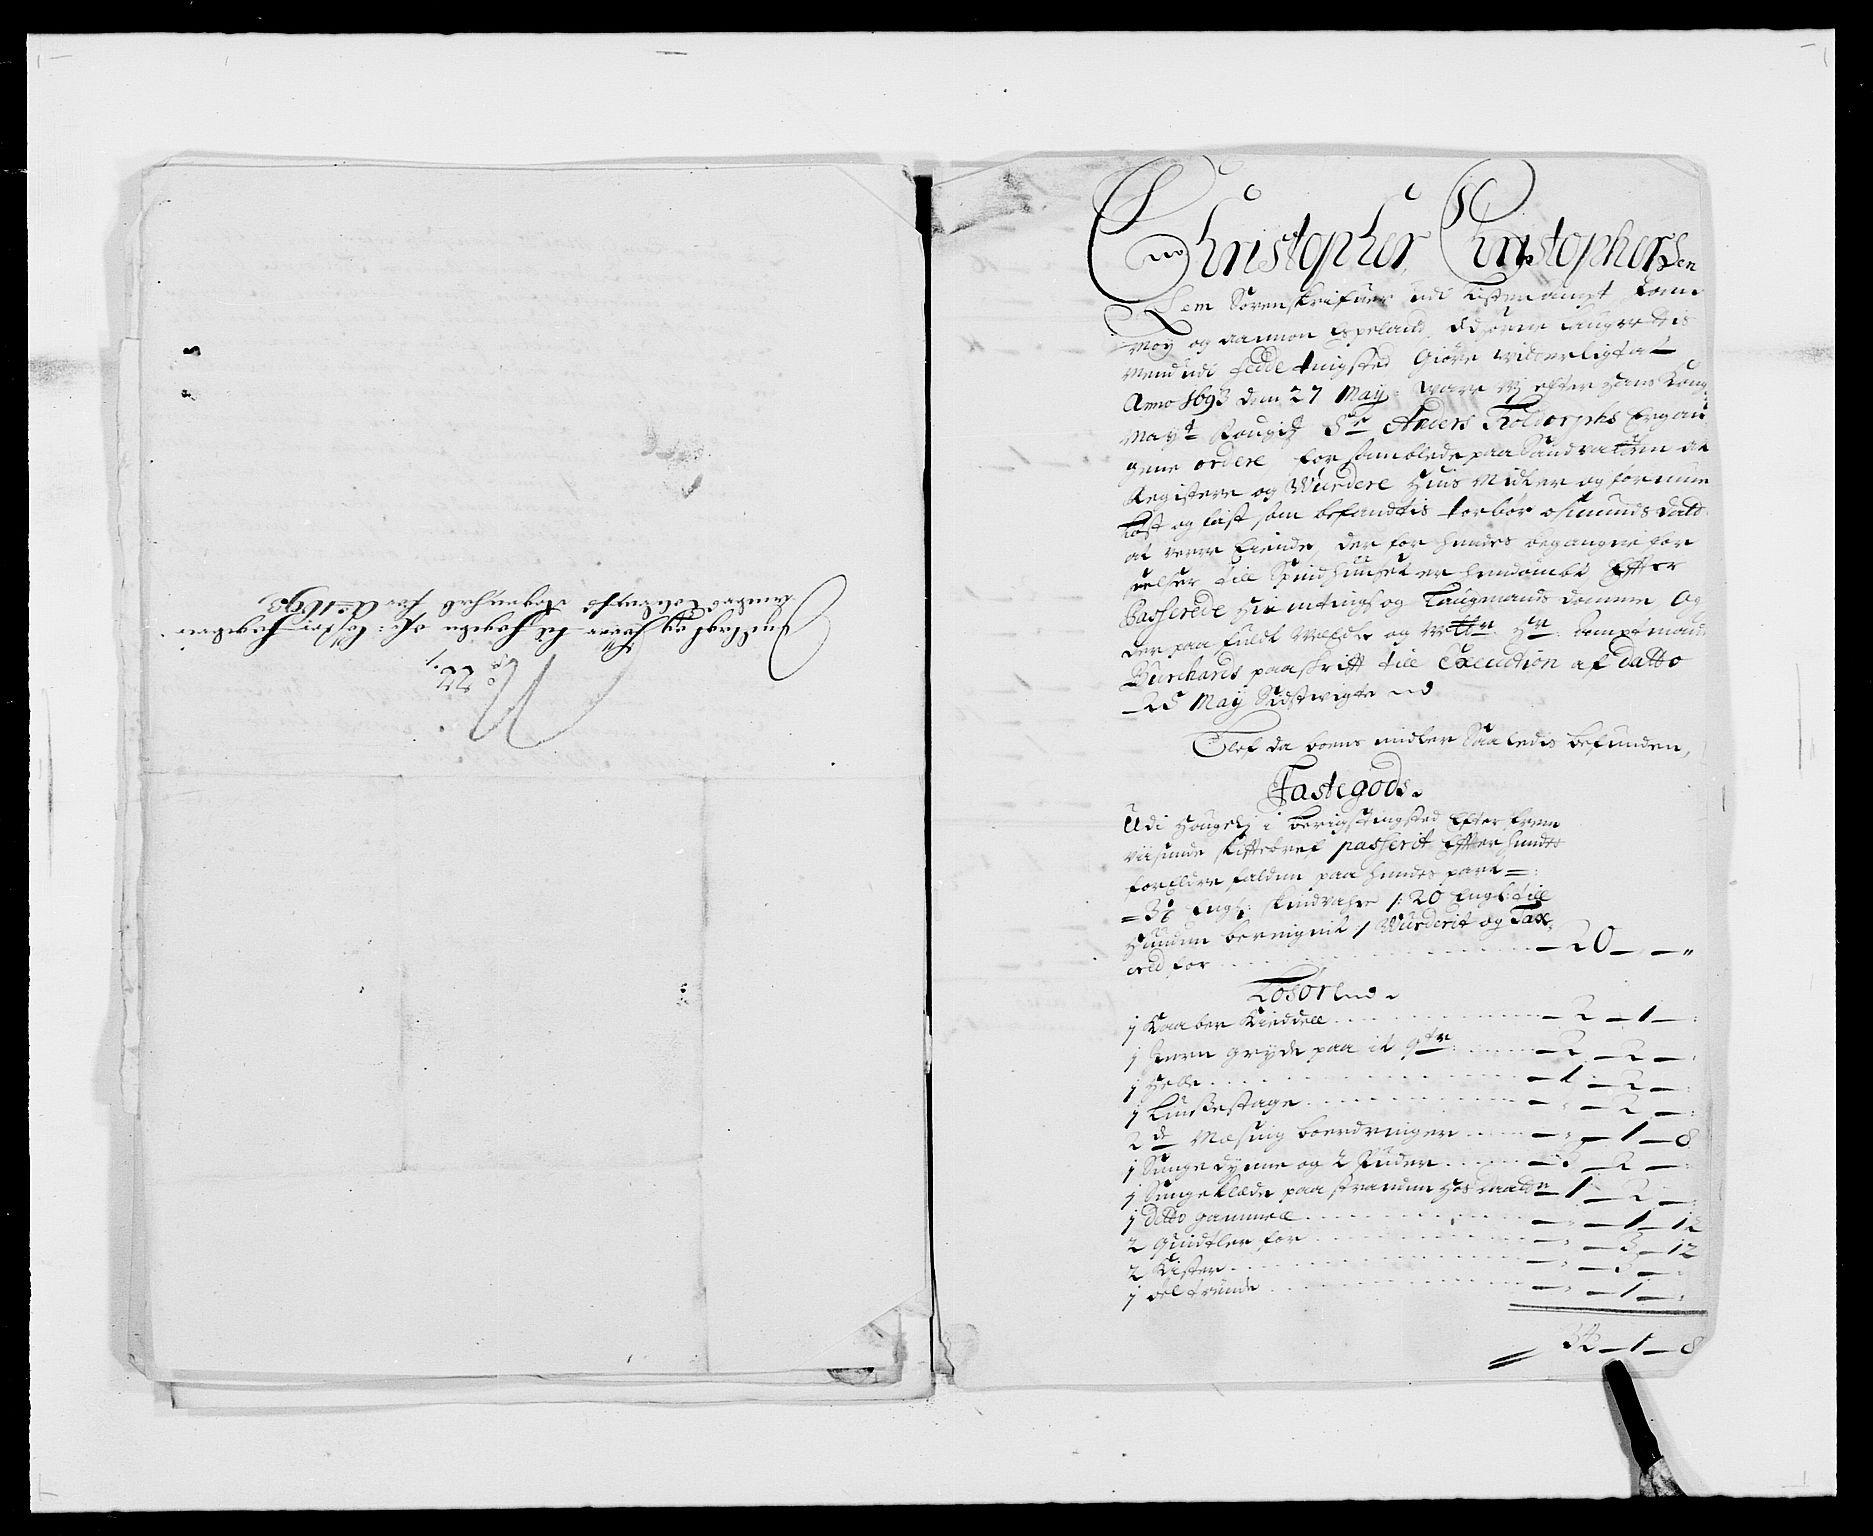 RA, Rentekammeret inntil 1814, Reviderte regnskaper, Fogderegnskap, R41/L2536: Fogderegnskap Lista, 1690-1693, s. 504